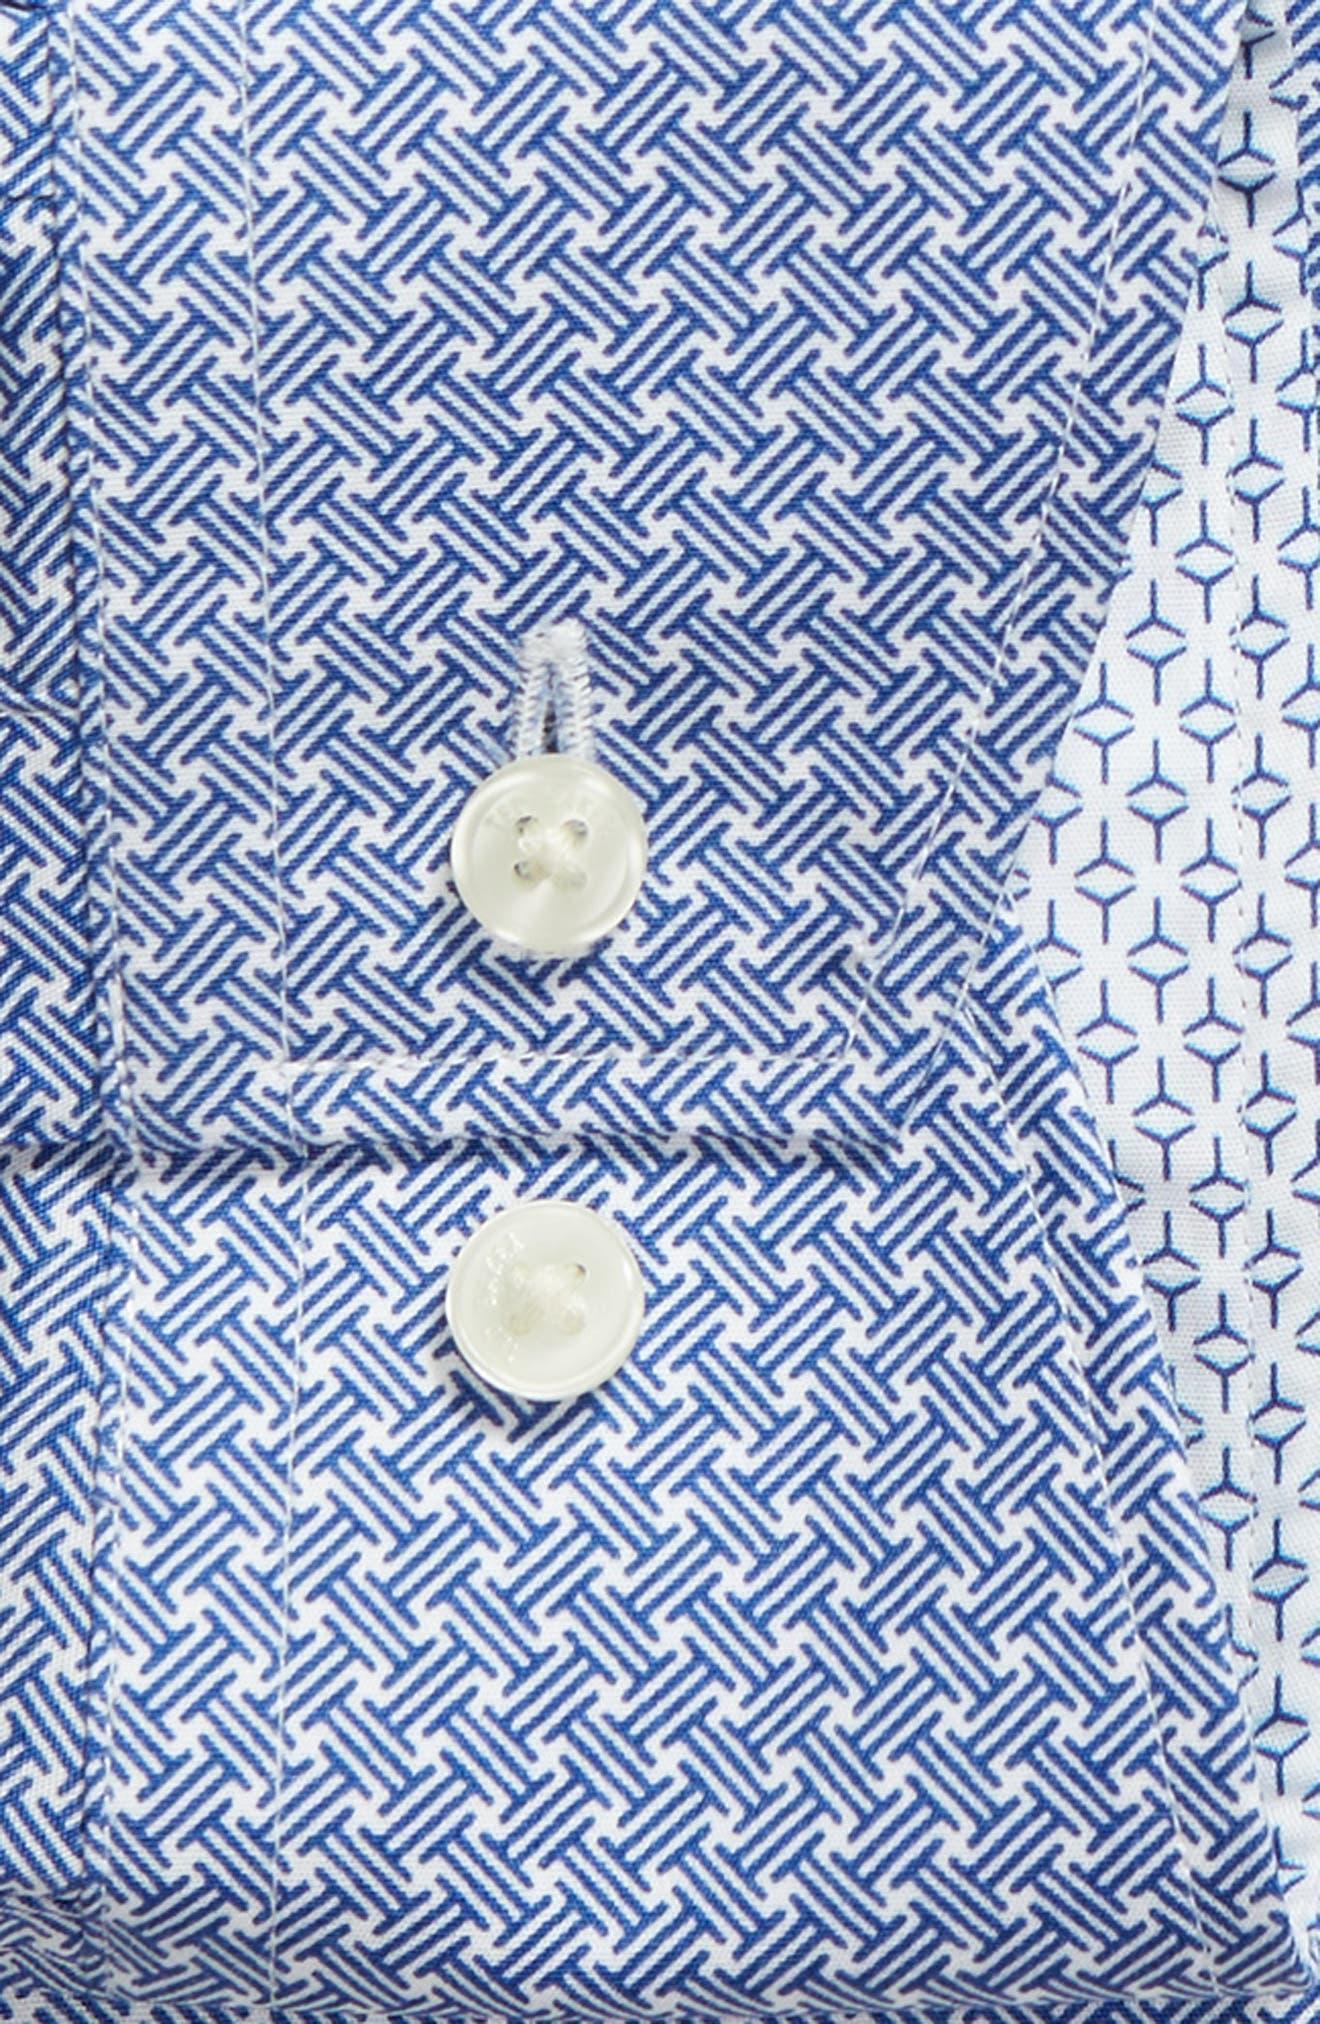 Rugber Slim Fit Print Dress Shirt,                             Alternate thumbnail 6, color,                             BLUE